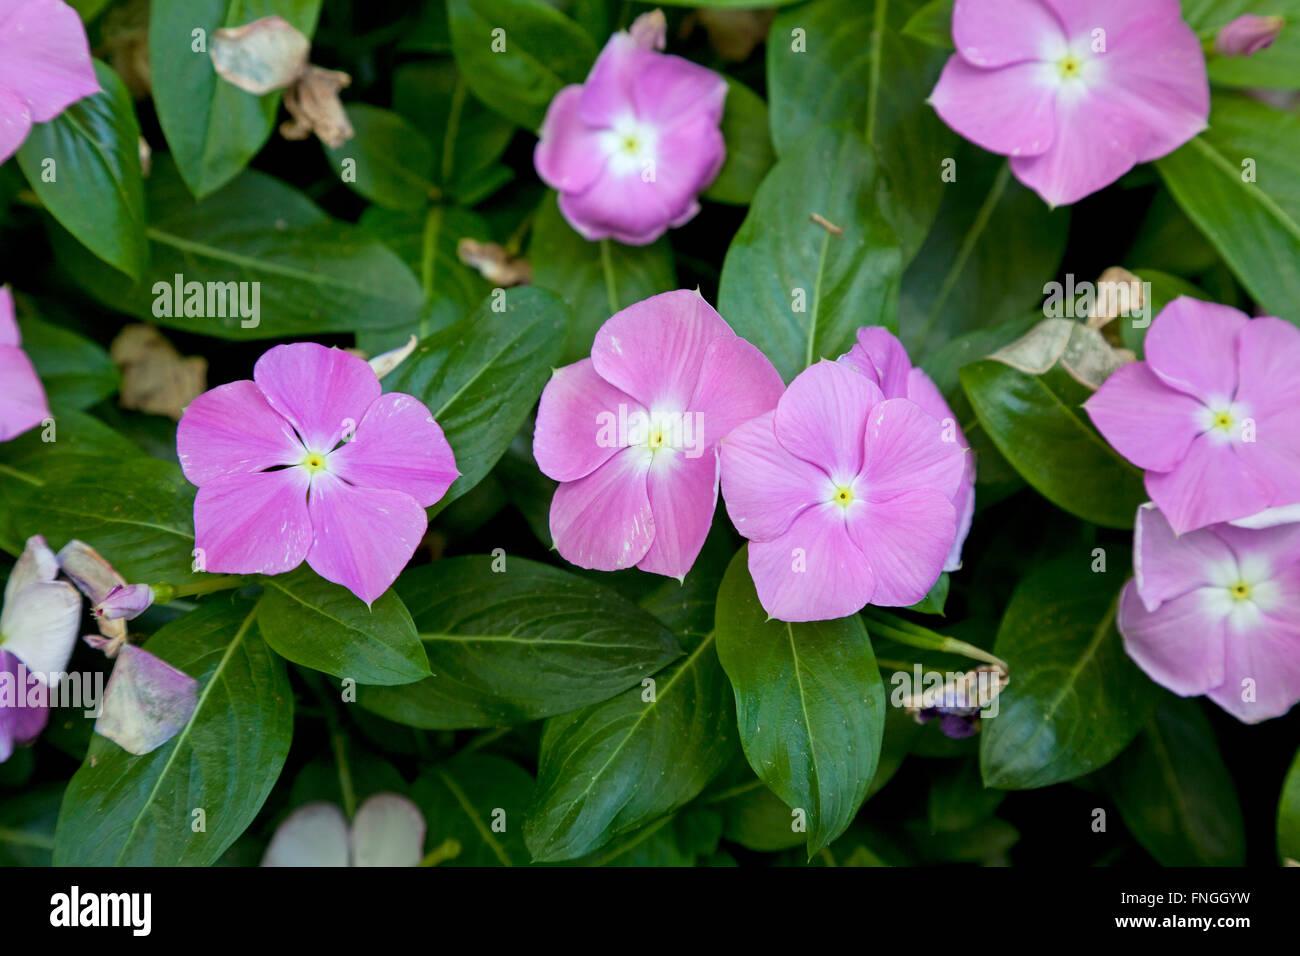 Pink periwinkle flowers stock photo 99324173 alamy pink periwinkle flowers mightylinksfo